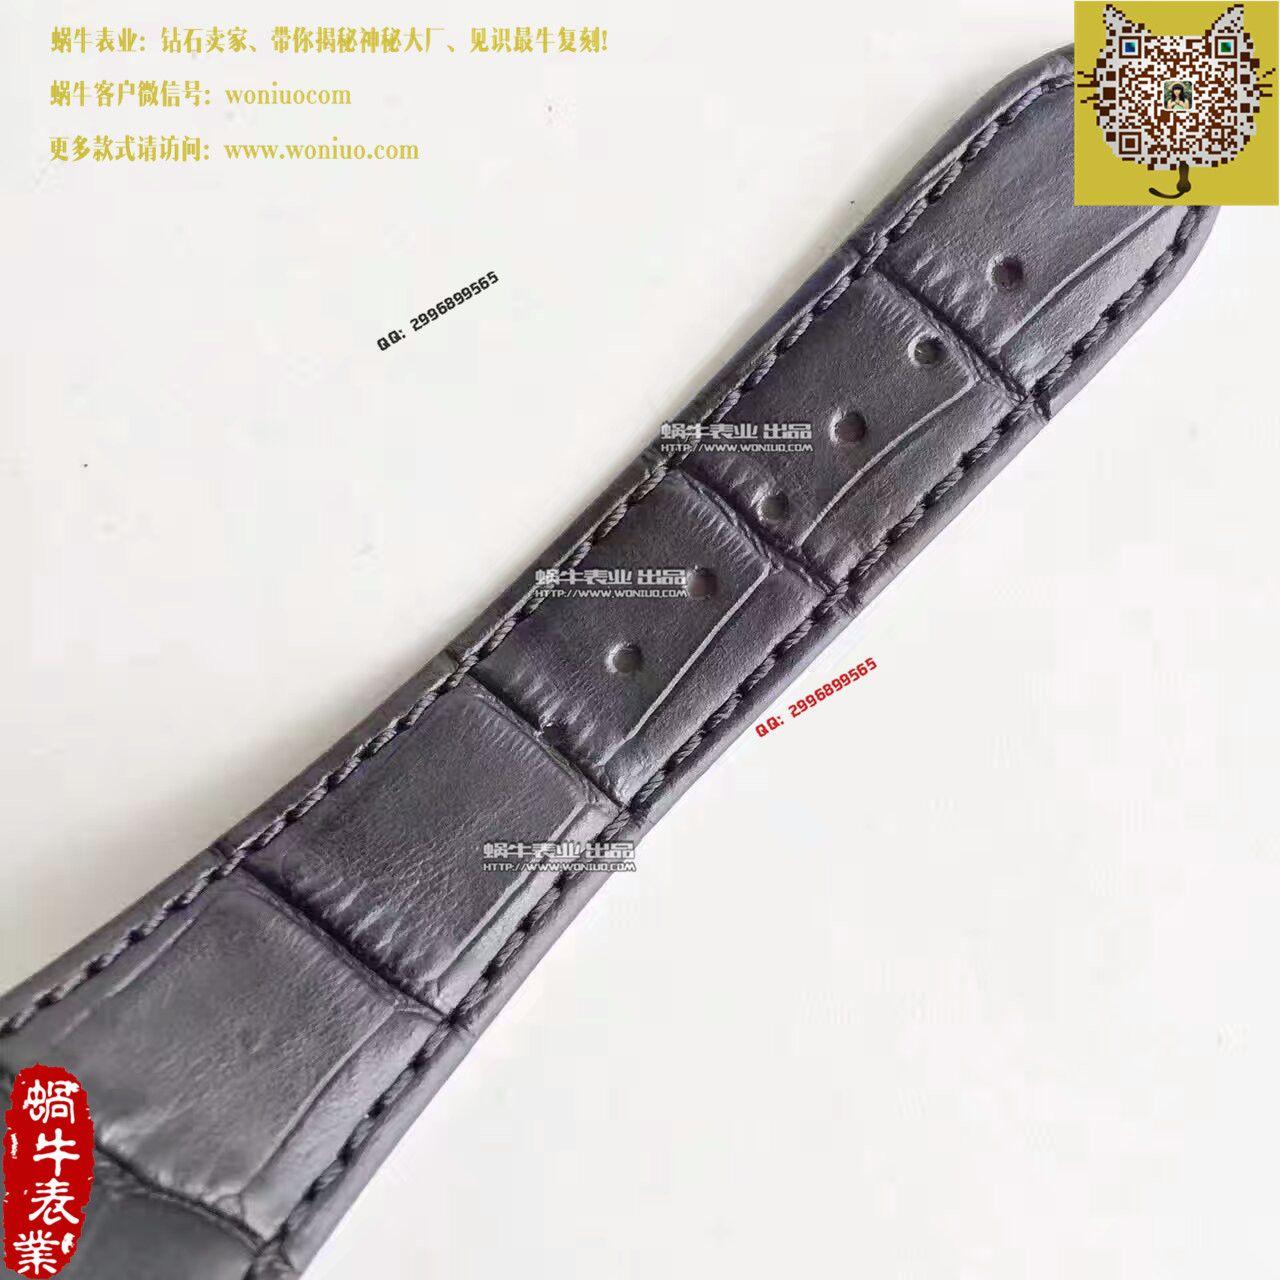 【BP厂一比一精仿手表】百达翡丽运动系列5980/1AR-001男表 / BD185